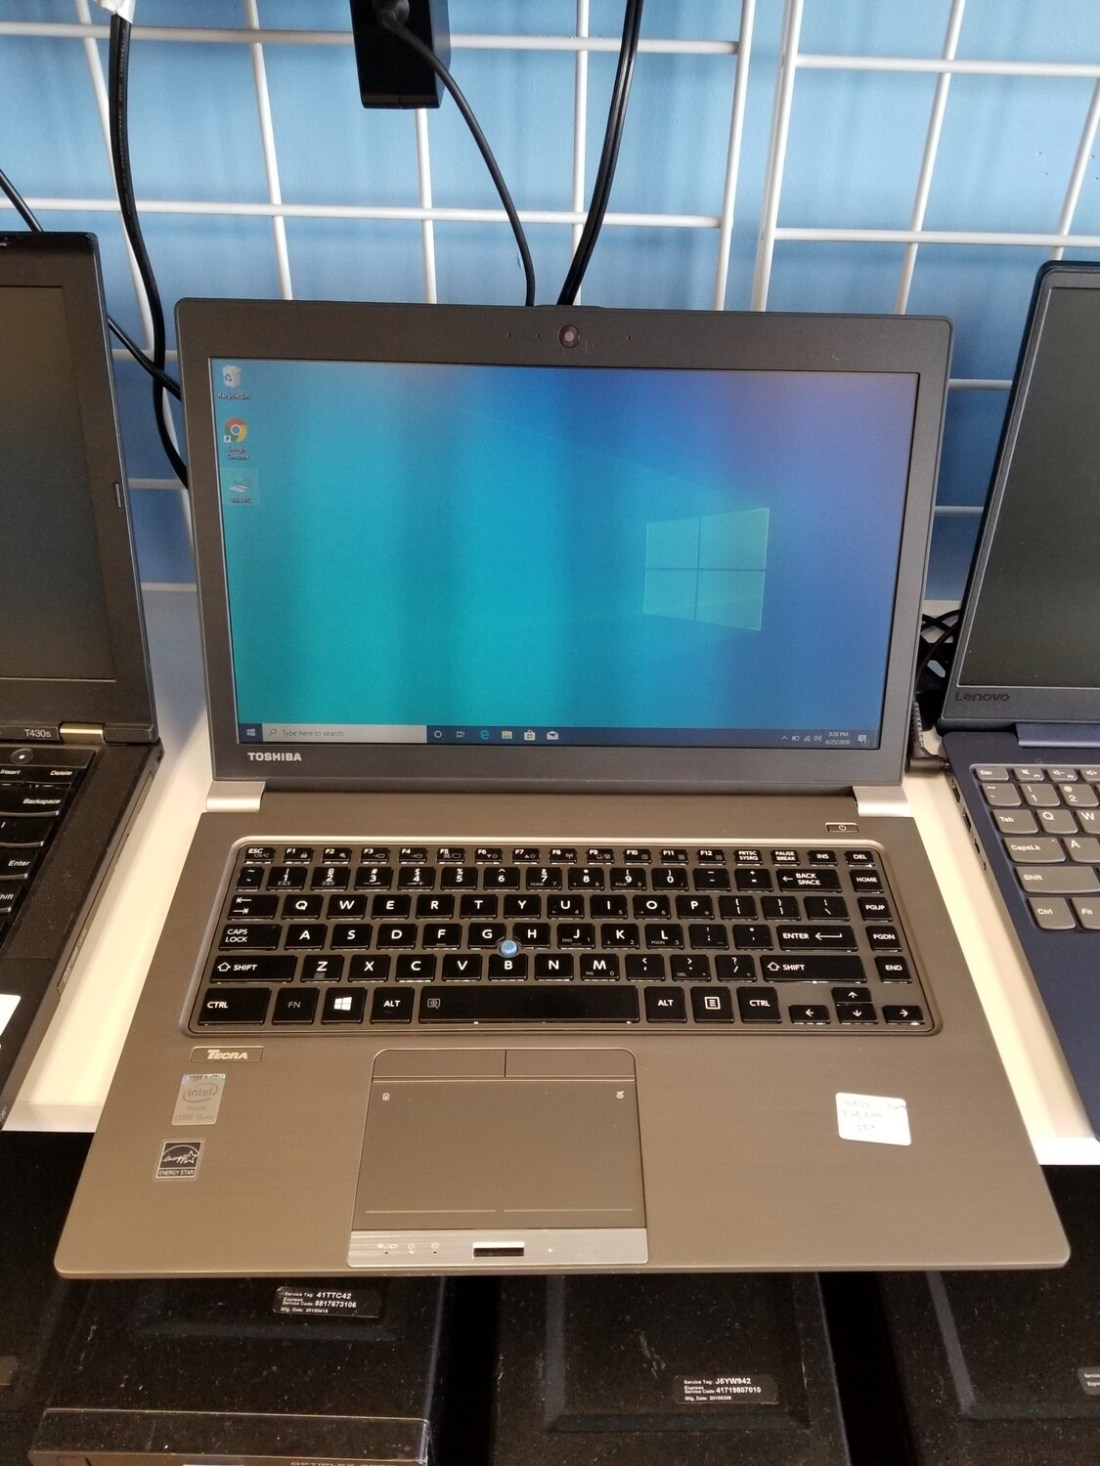 Toshiba Intel i5 8GB RAM 128GB SSD Windows 10 Light weight